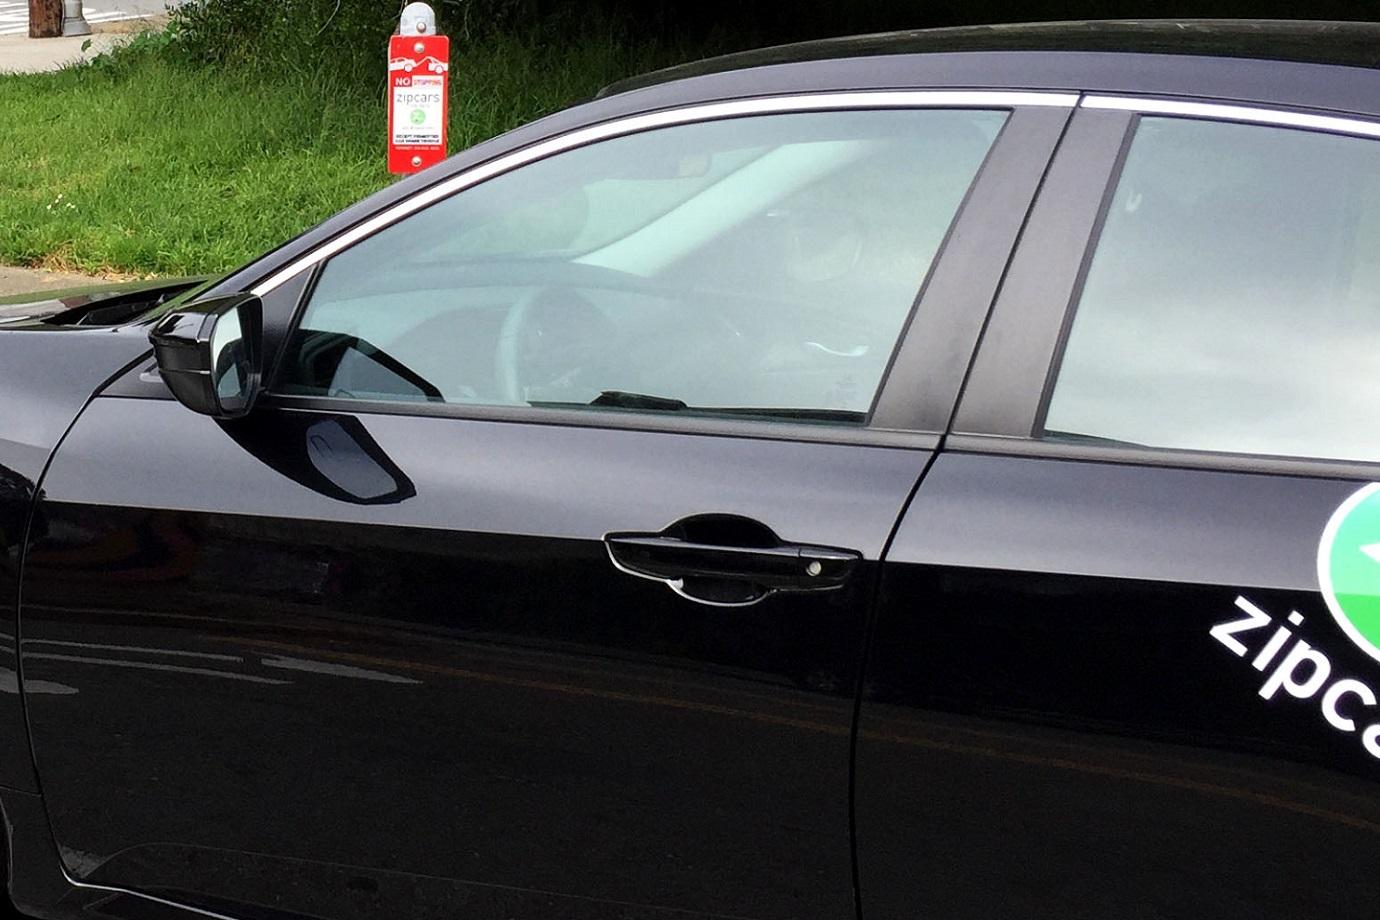 On-Street Shared Vehicle Parking Permit Program | SFMTA